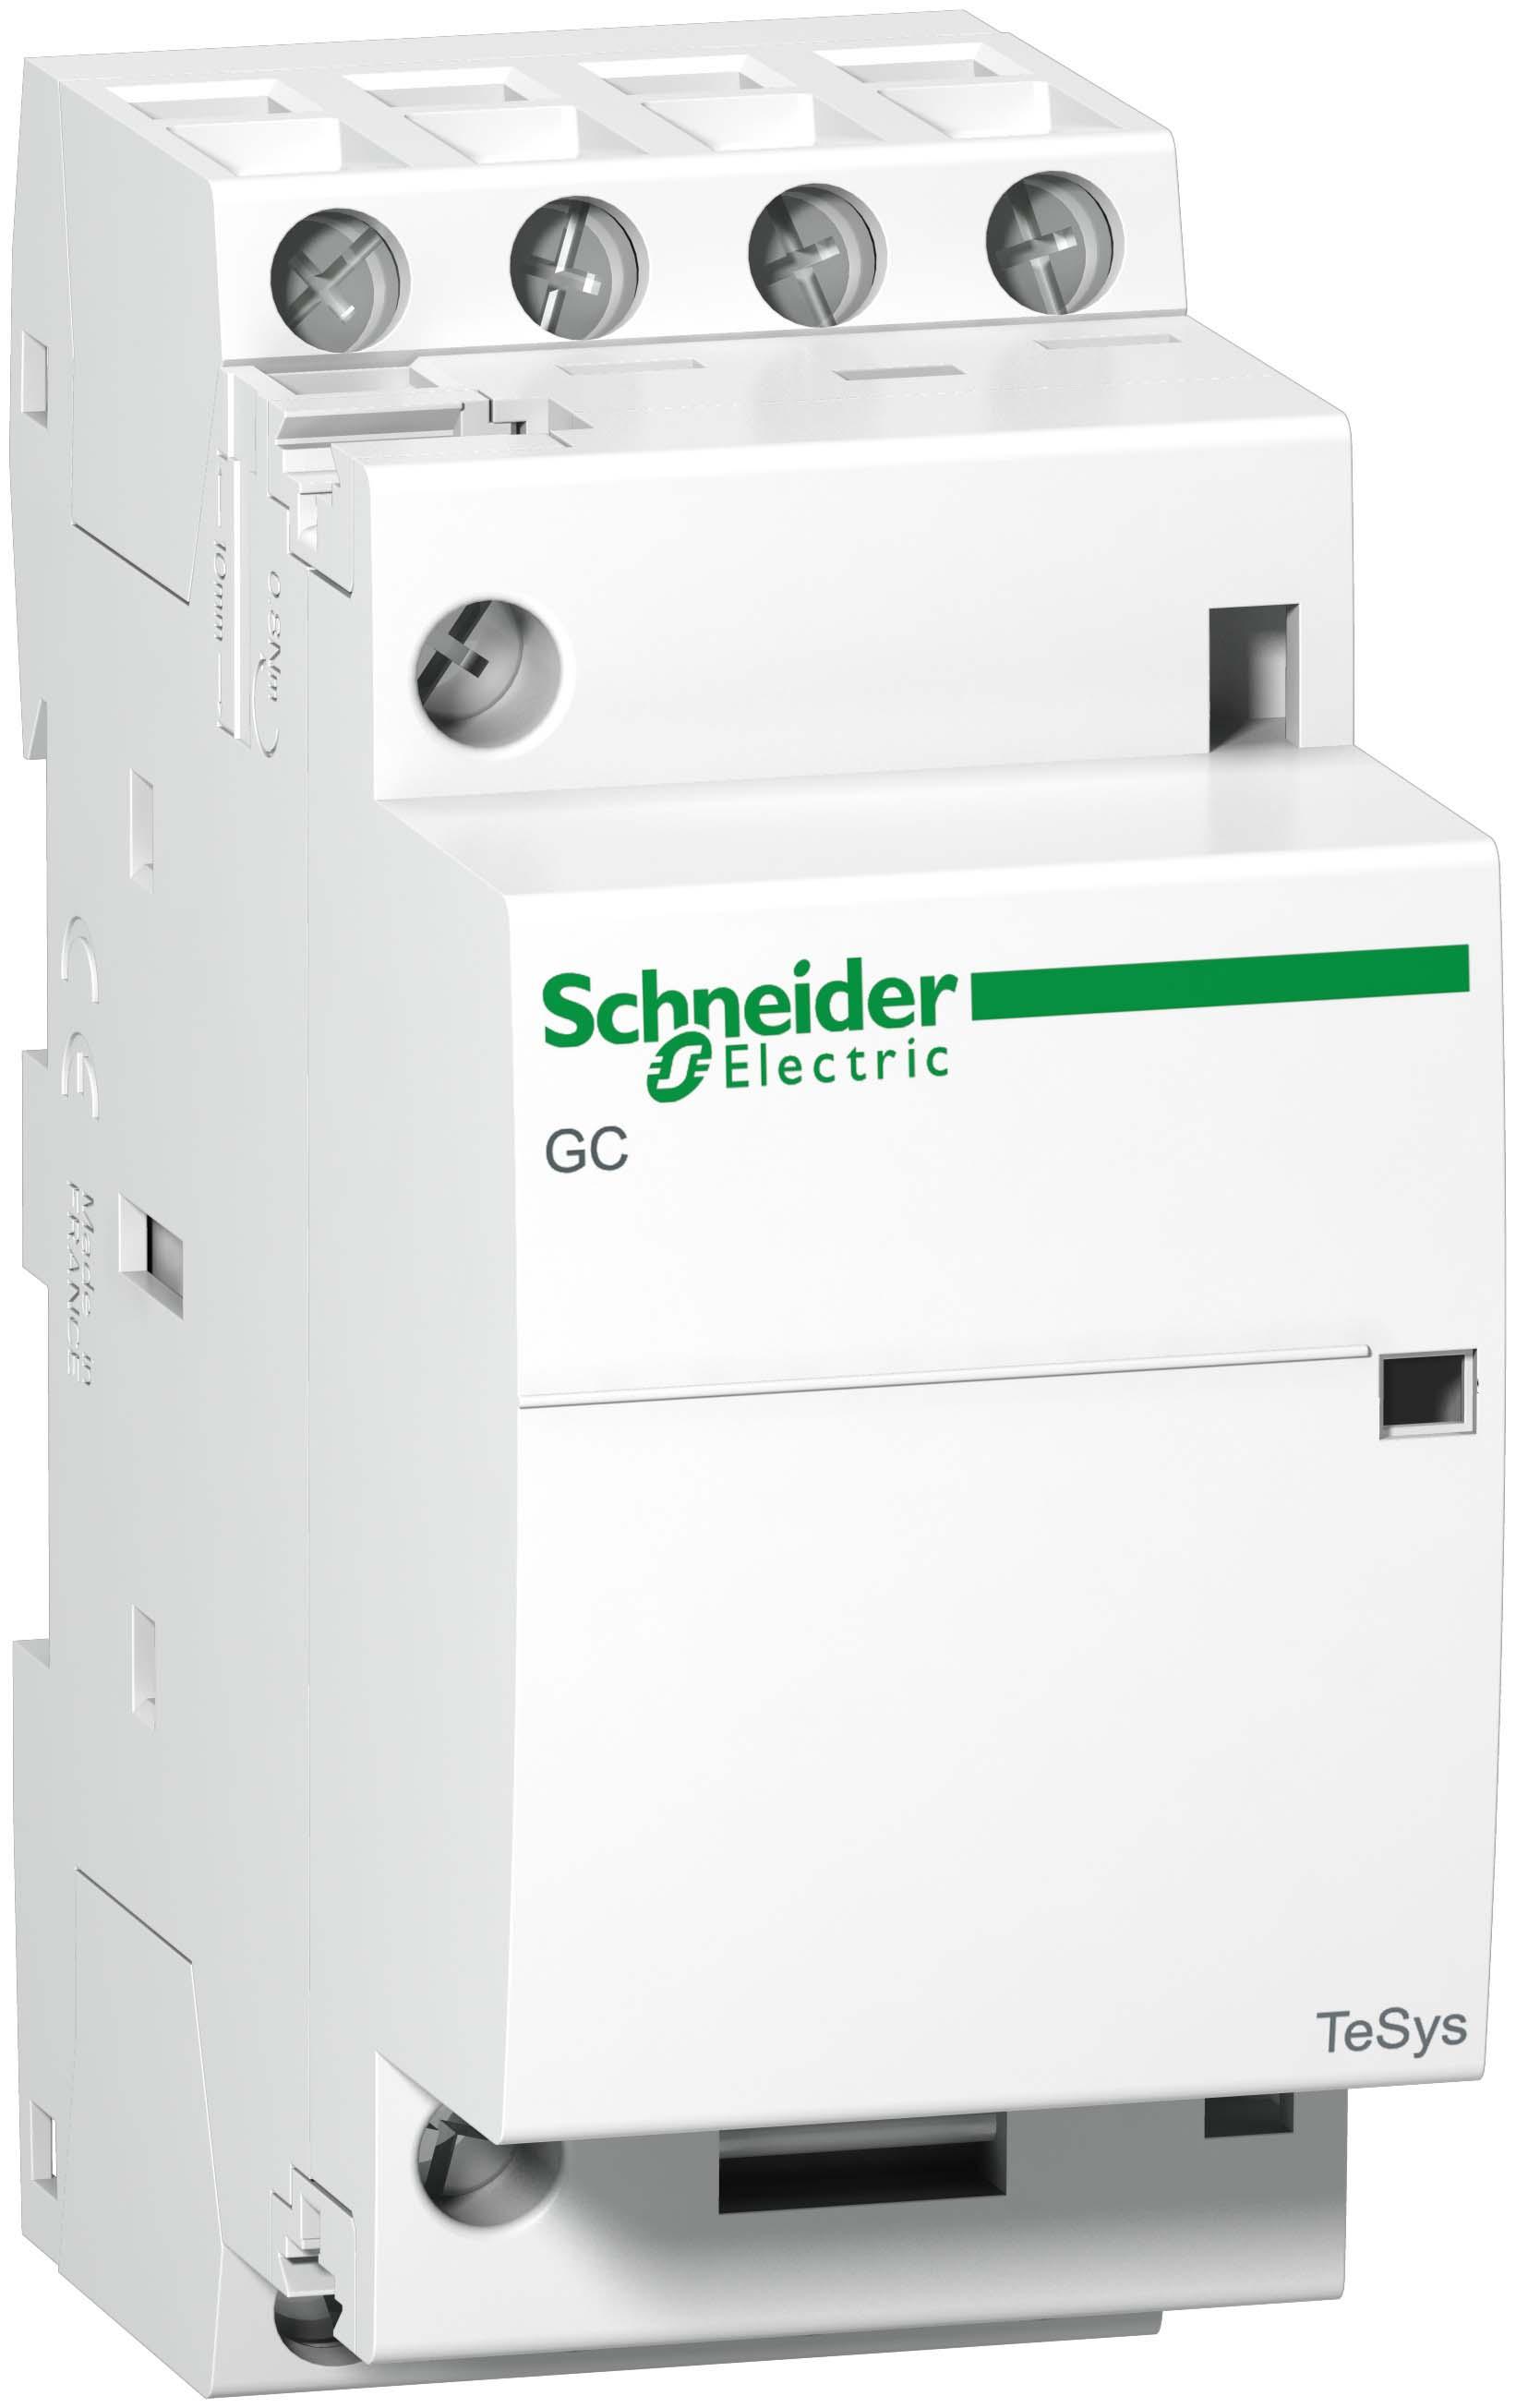 Image Description for https://tedi.itc-electronics.com/itcmedia/images/20190424/GC2522B5_SCHNEIDERELECTRIC_2.jpg